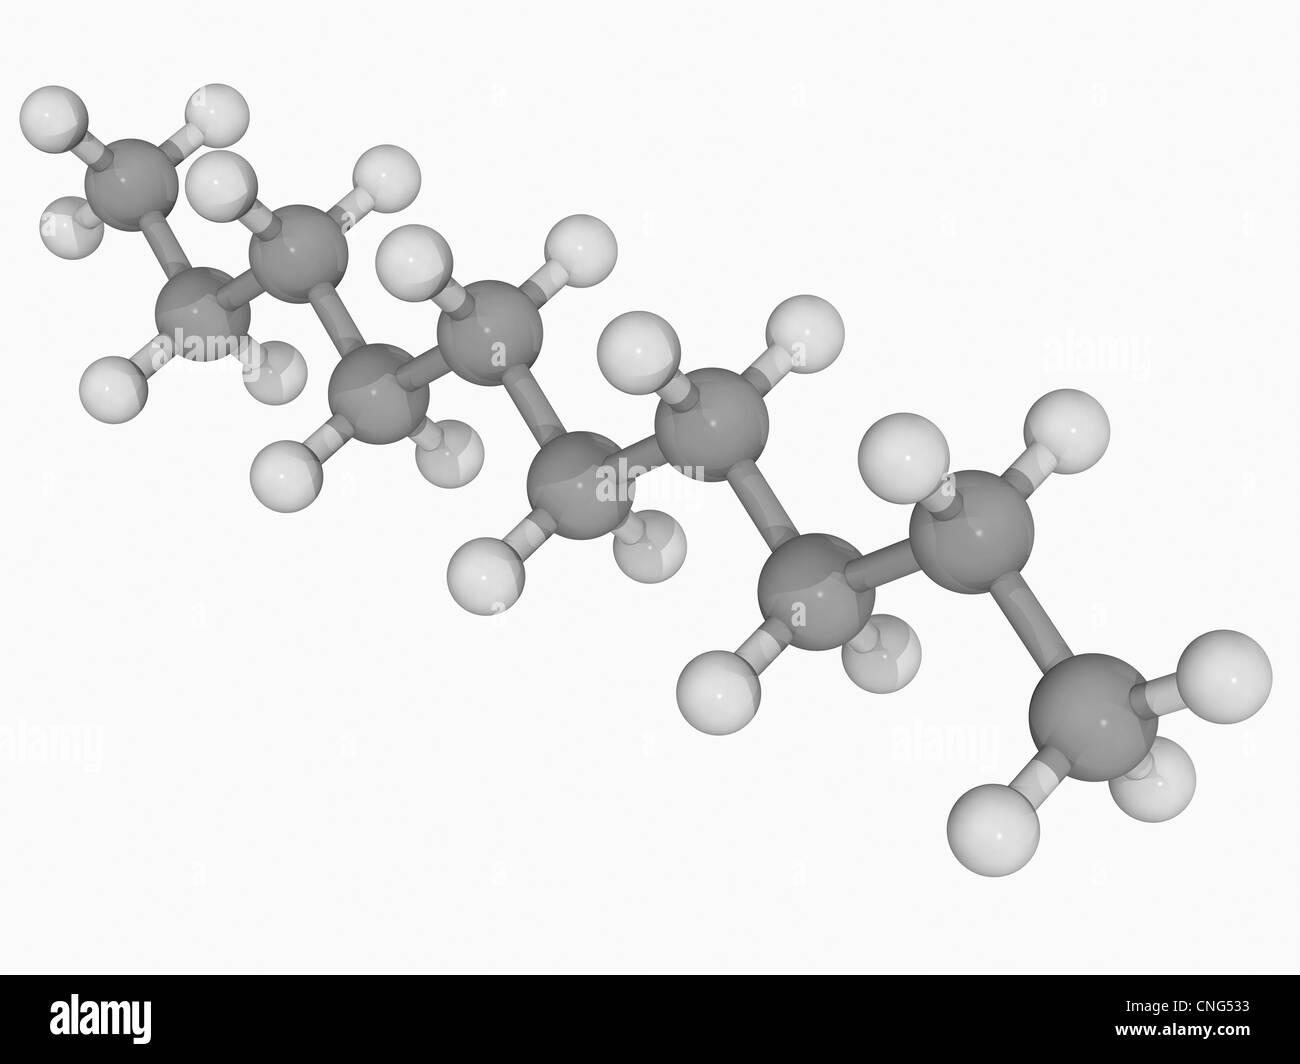 Decane molecule - Stock Image